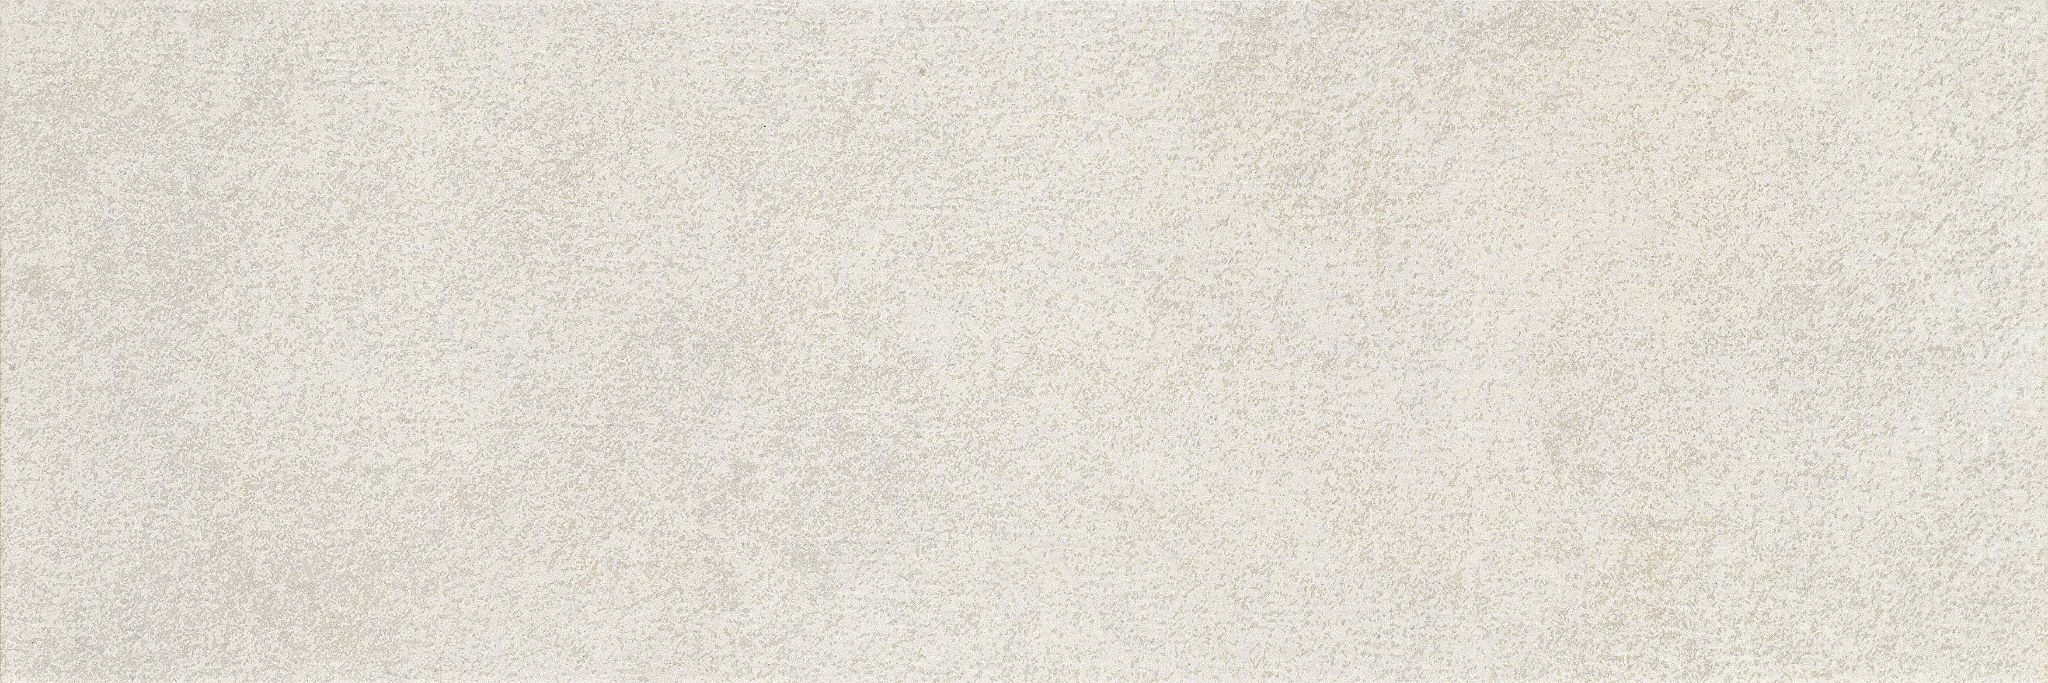 Select grey 180203 20x60x0,95 - Hansas Plaadimaailm